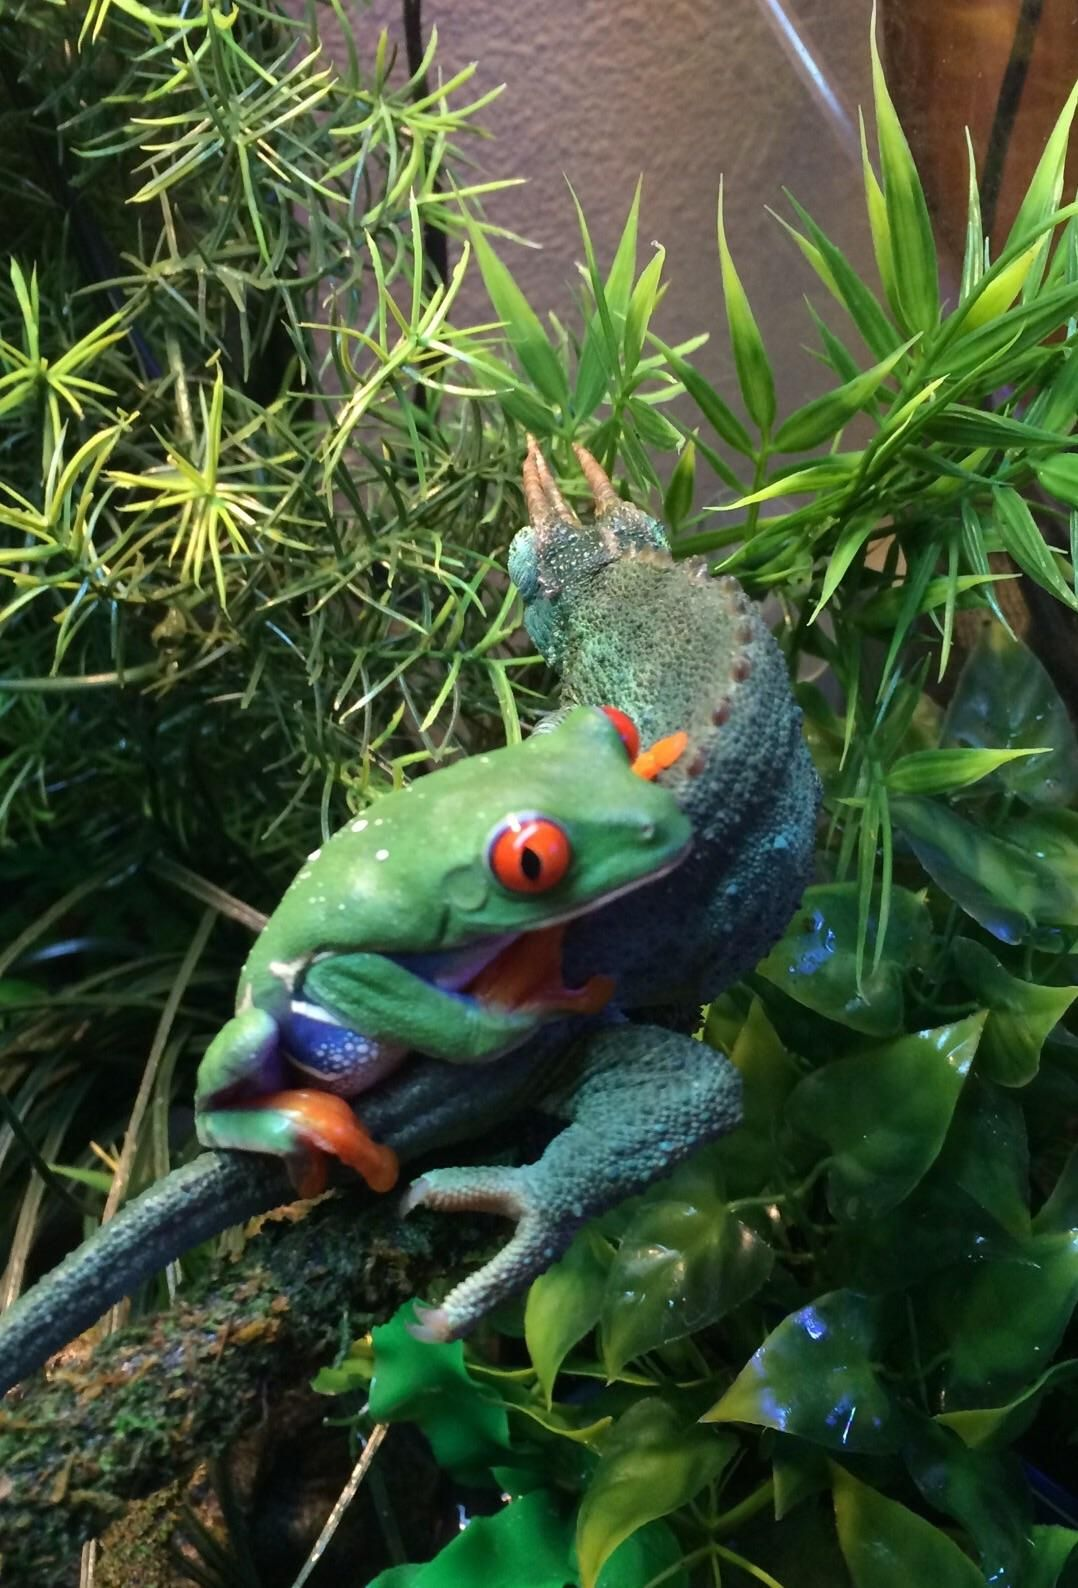 Redeyed tree frog cuddling my Jackson's chameleon Red